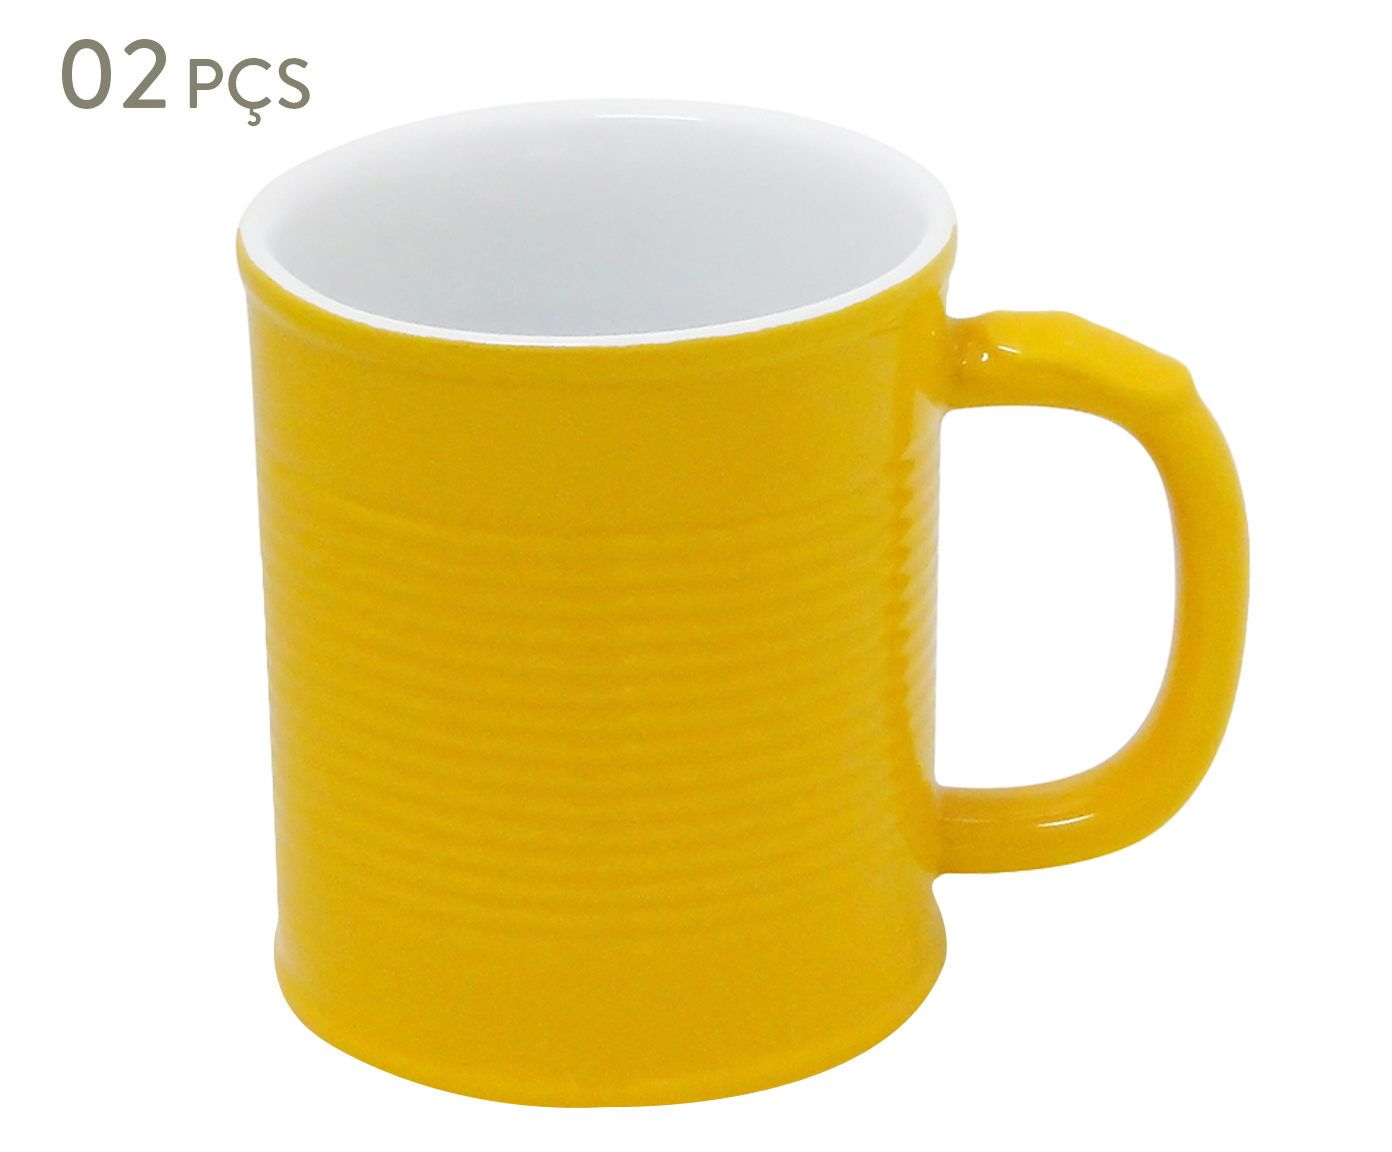 Conjunto de Canecas Espalier soleil - 250 ml | Westwing.com.br